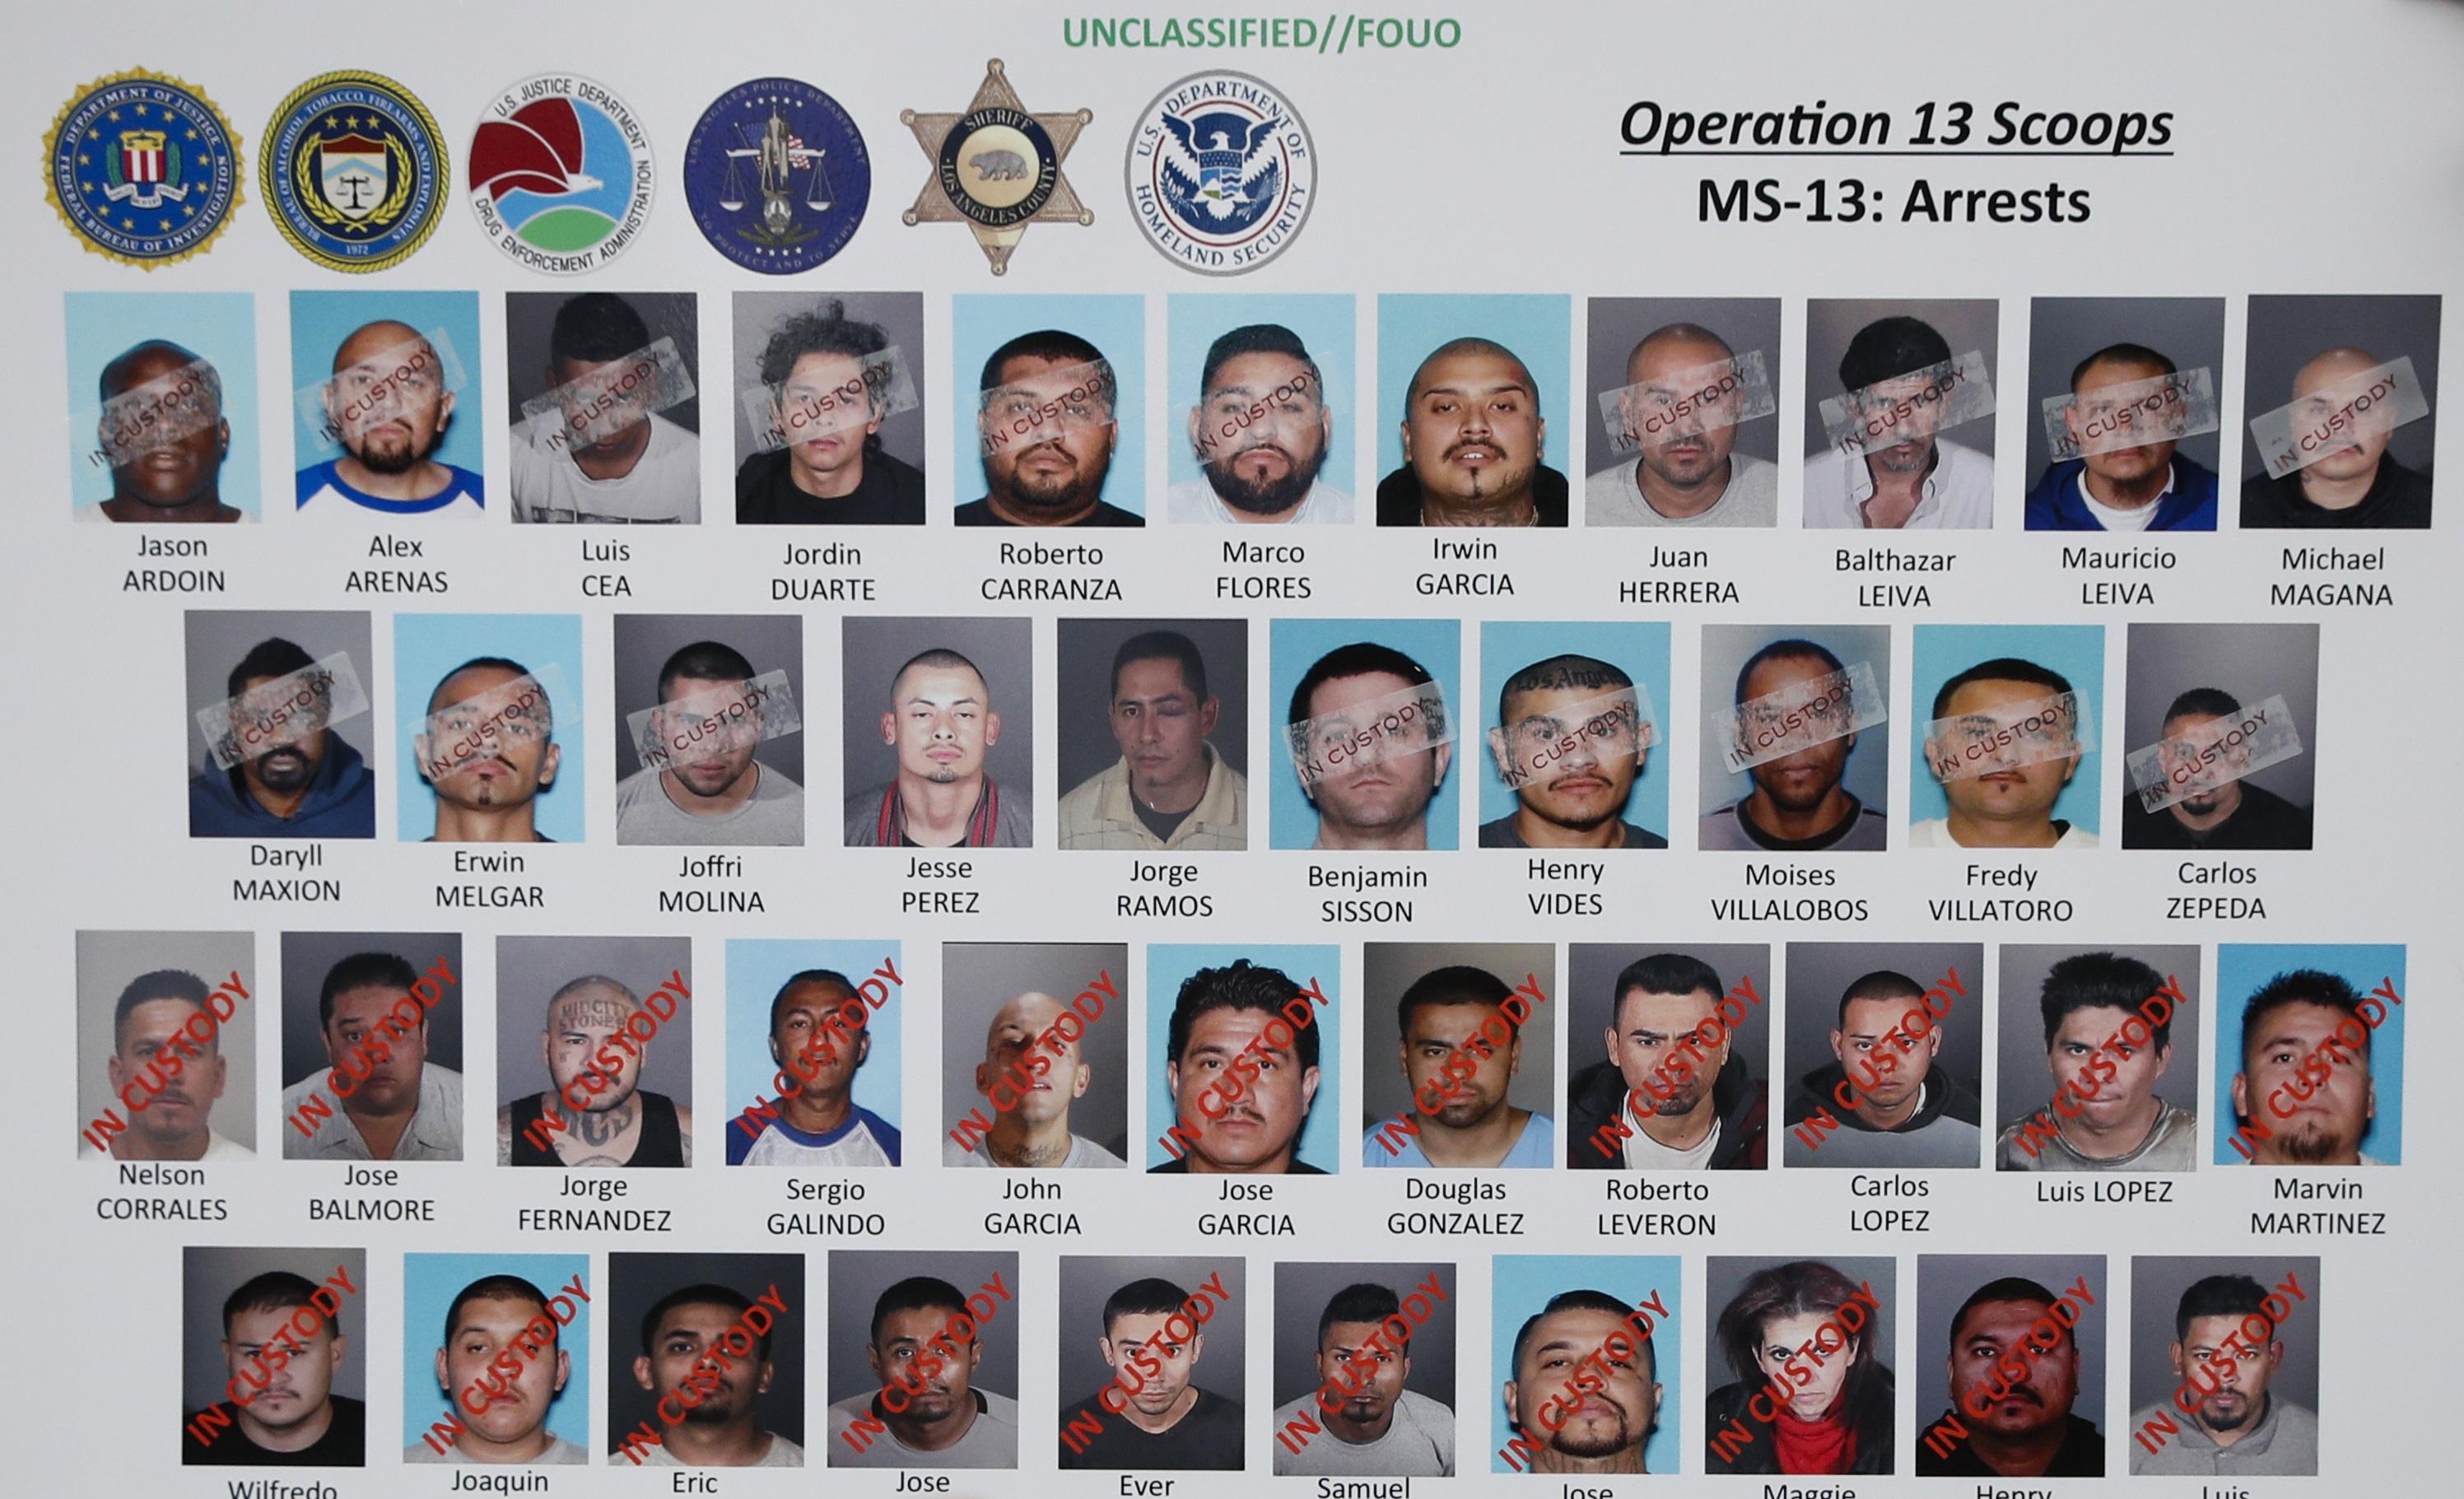 Inside the Mara Salvatrucha gang in Los Angeles: Leadership